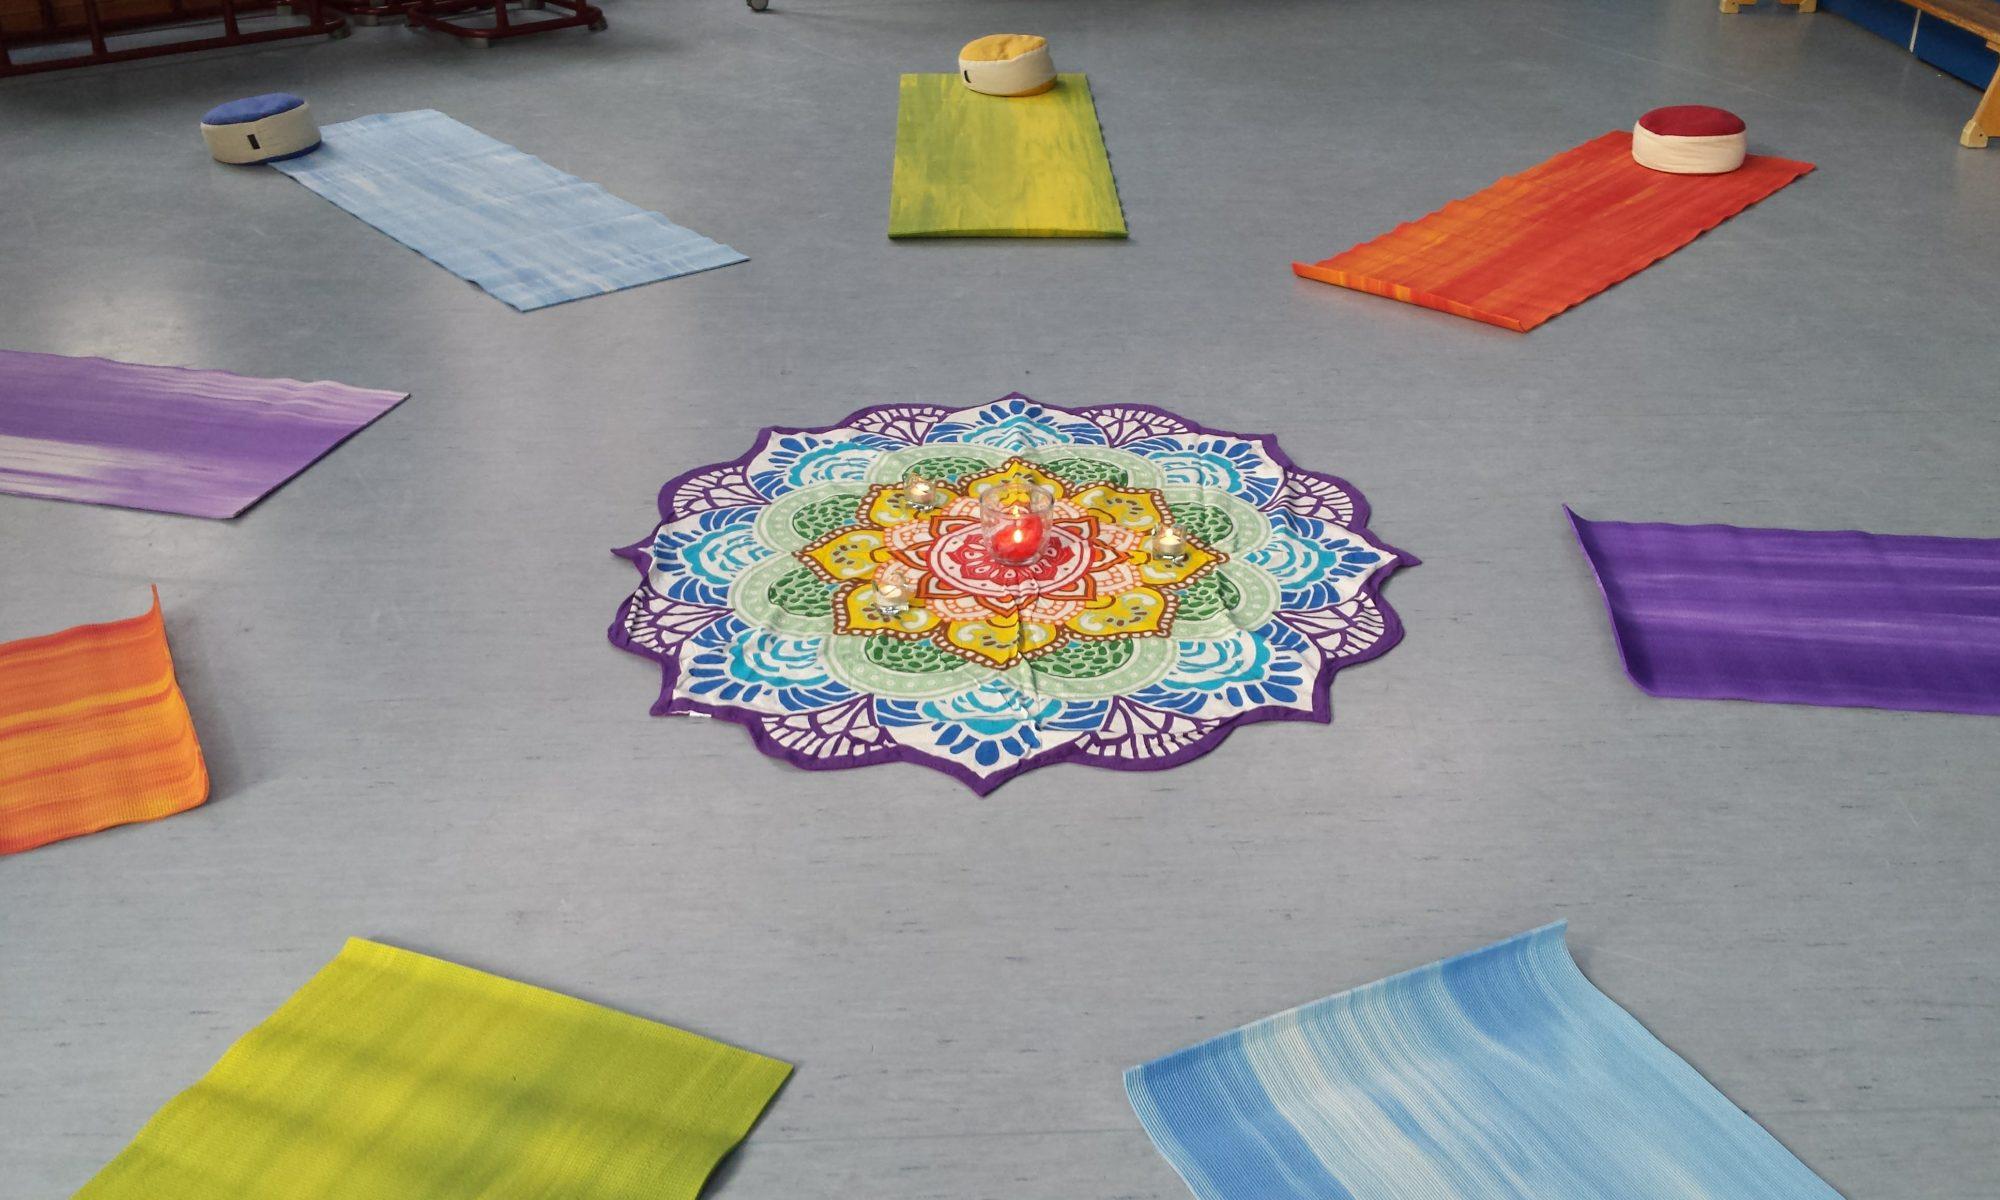 Yogazin Amersfoort